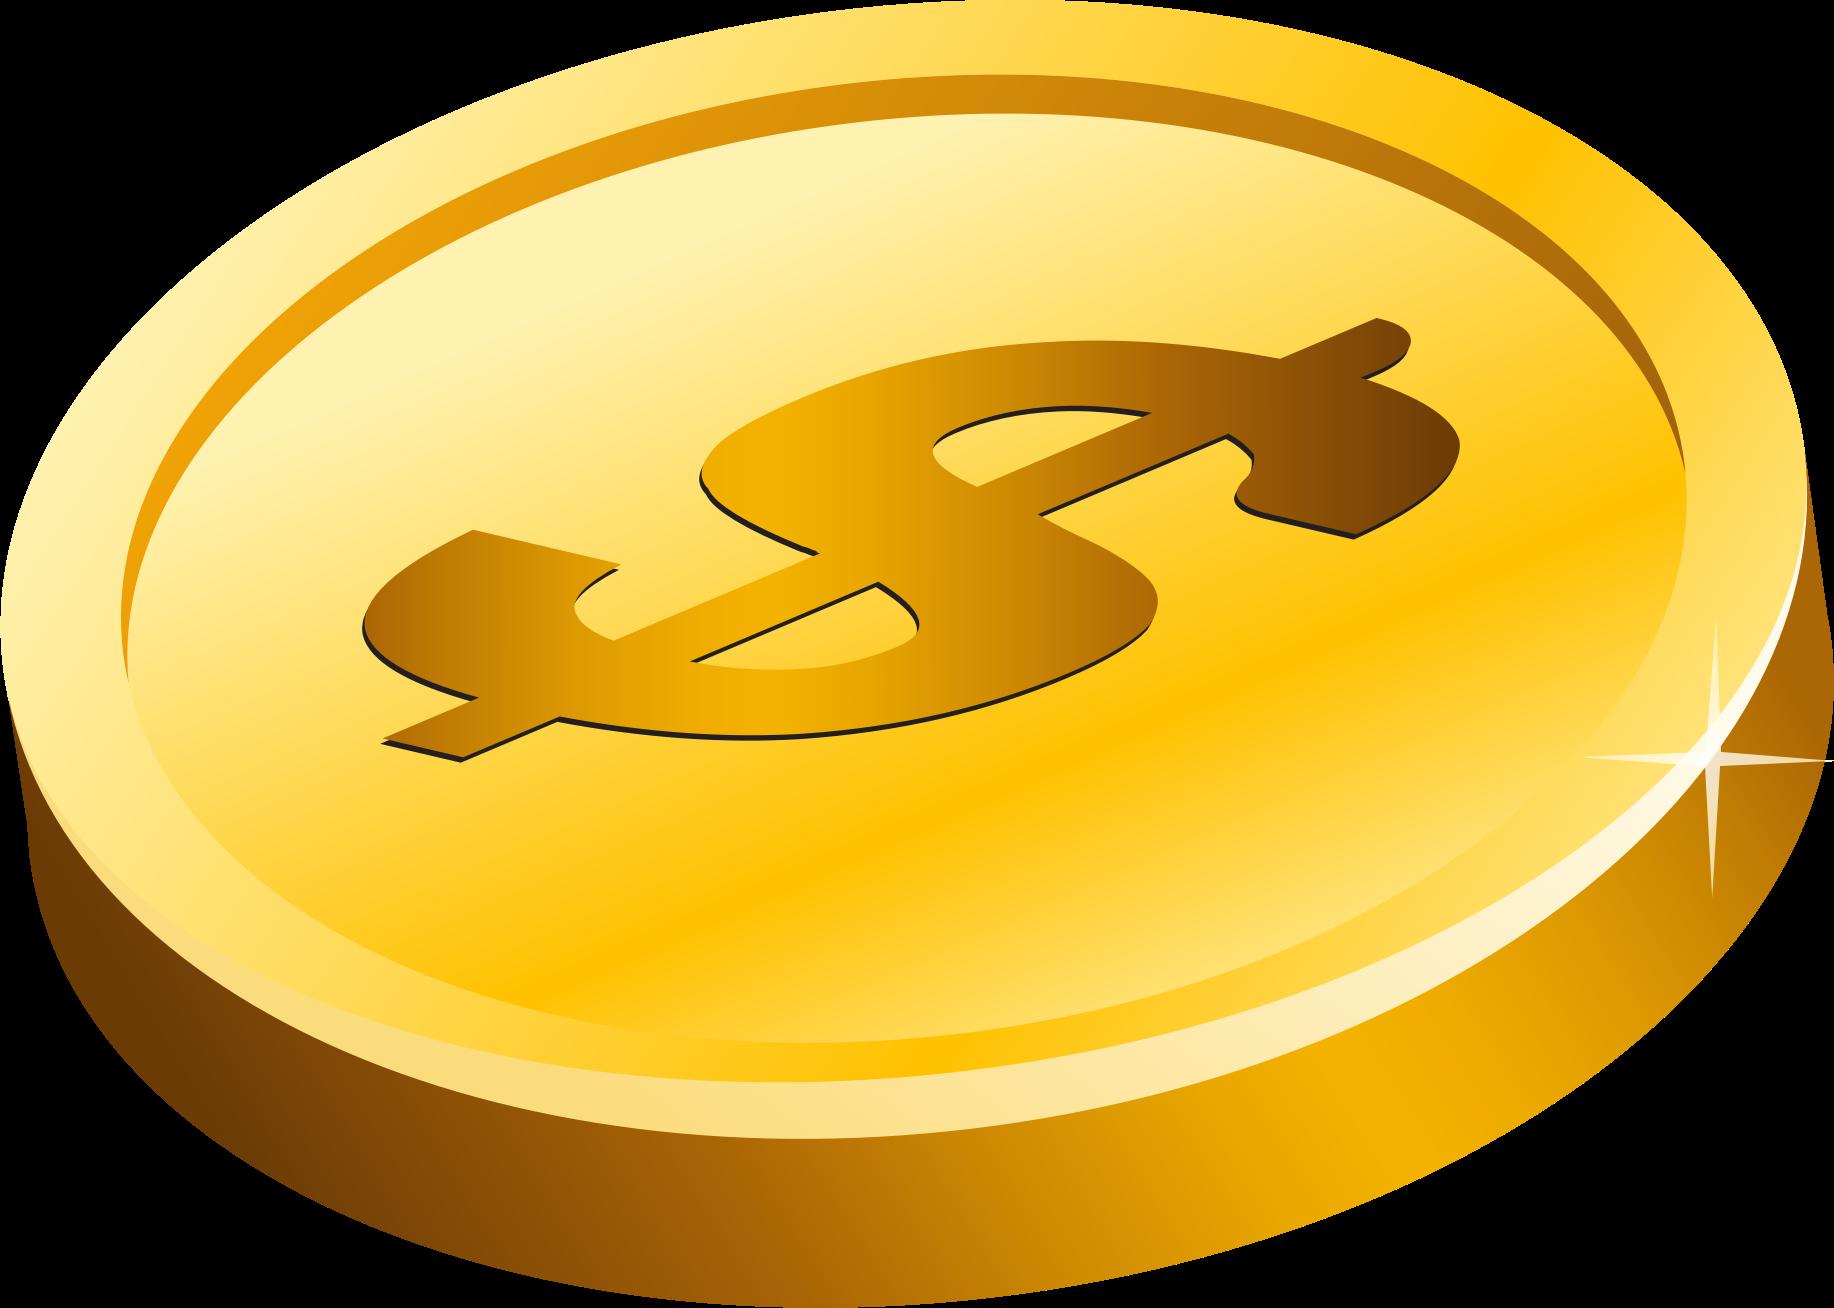 gold coin vector art image free stock photo public